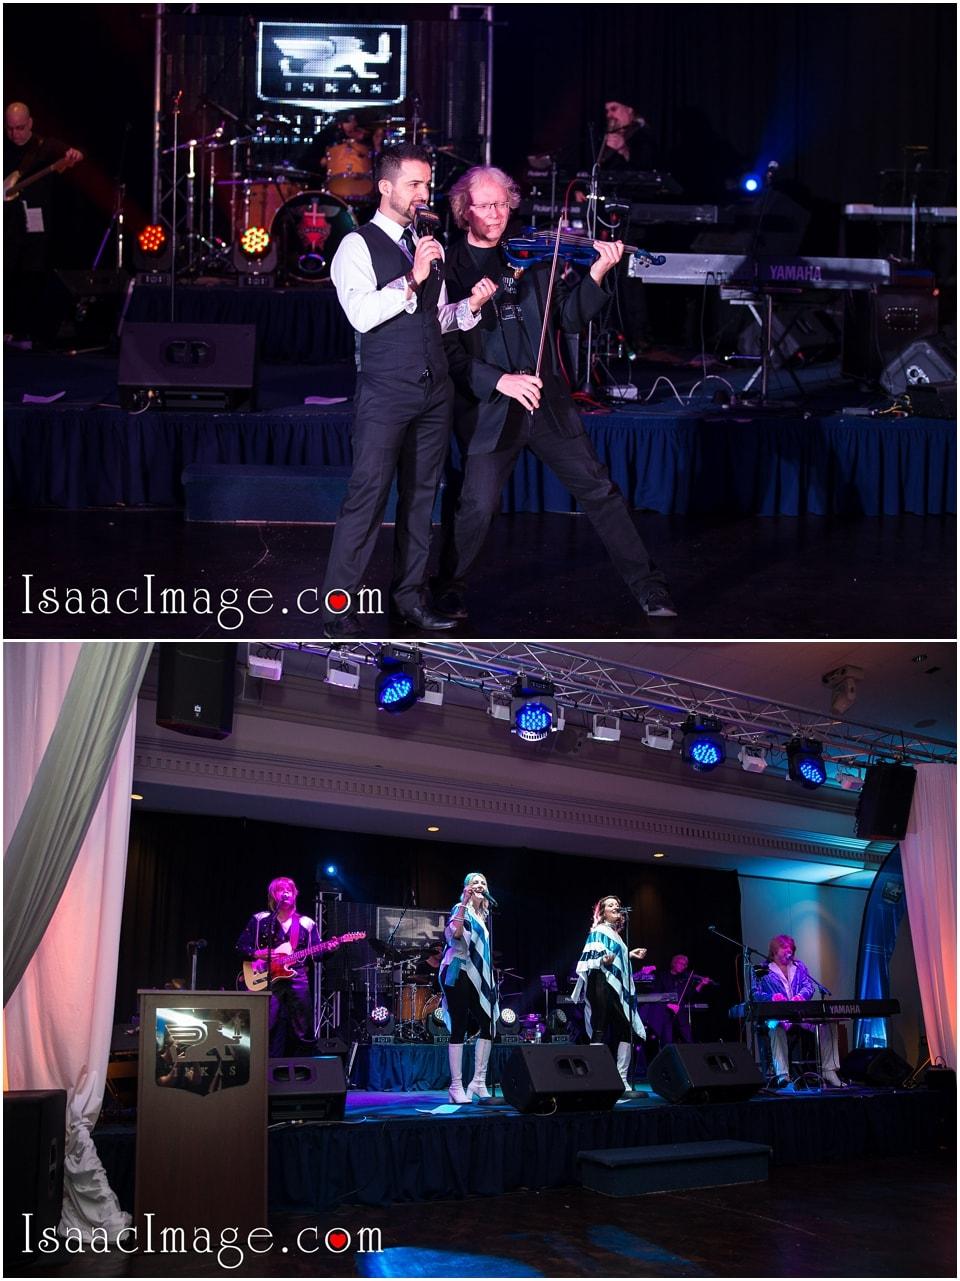 Toronto INKAS anniversary event_7256.jpg